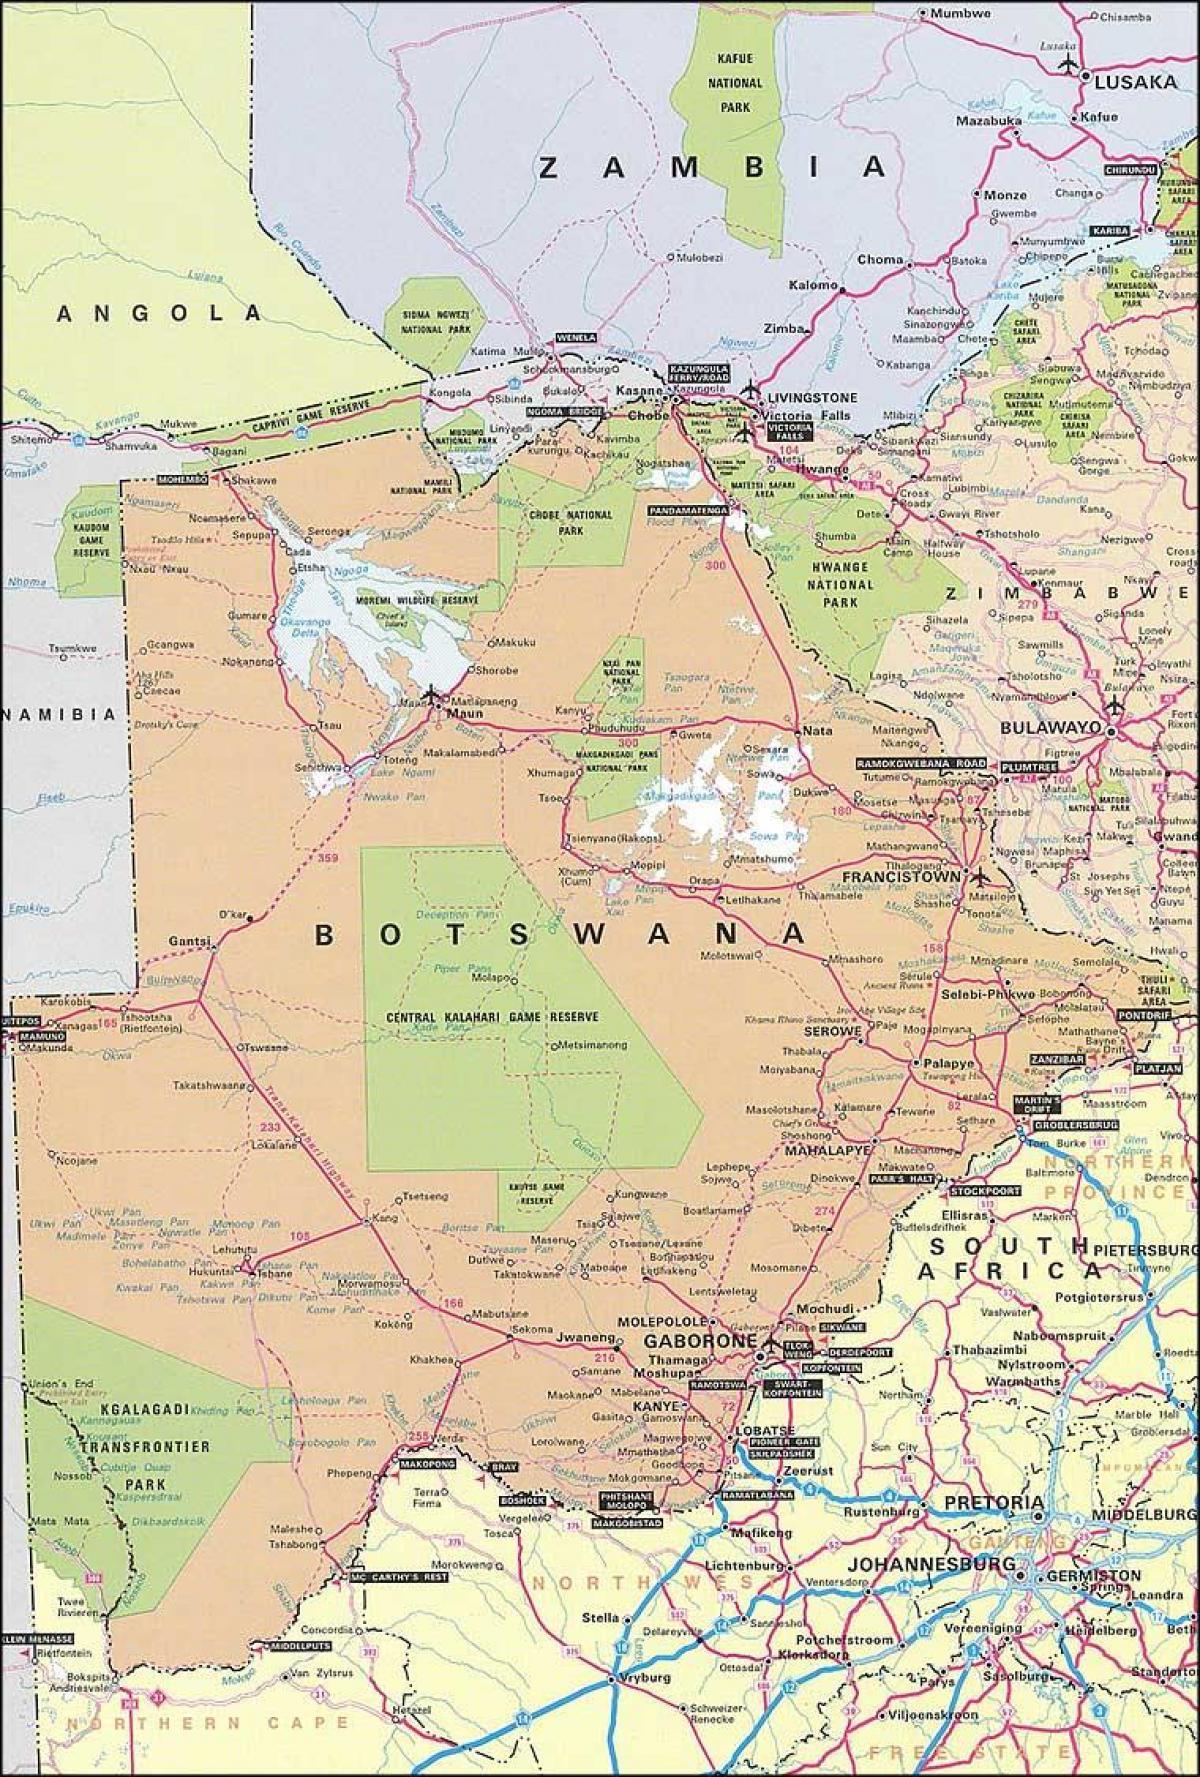 Botswana roads map   Road map of Botswana (Southern Africa   Africa)